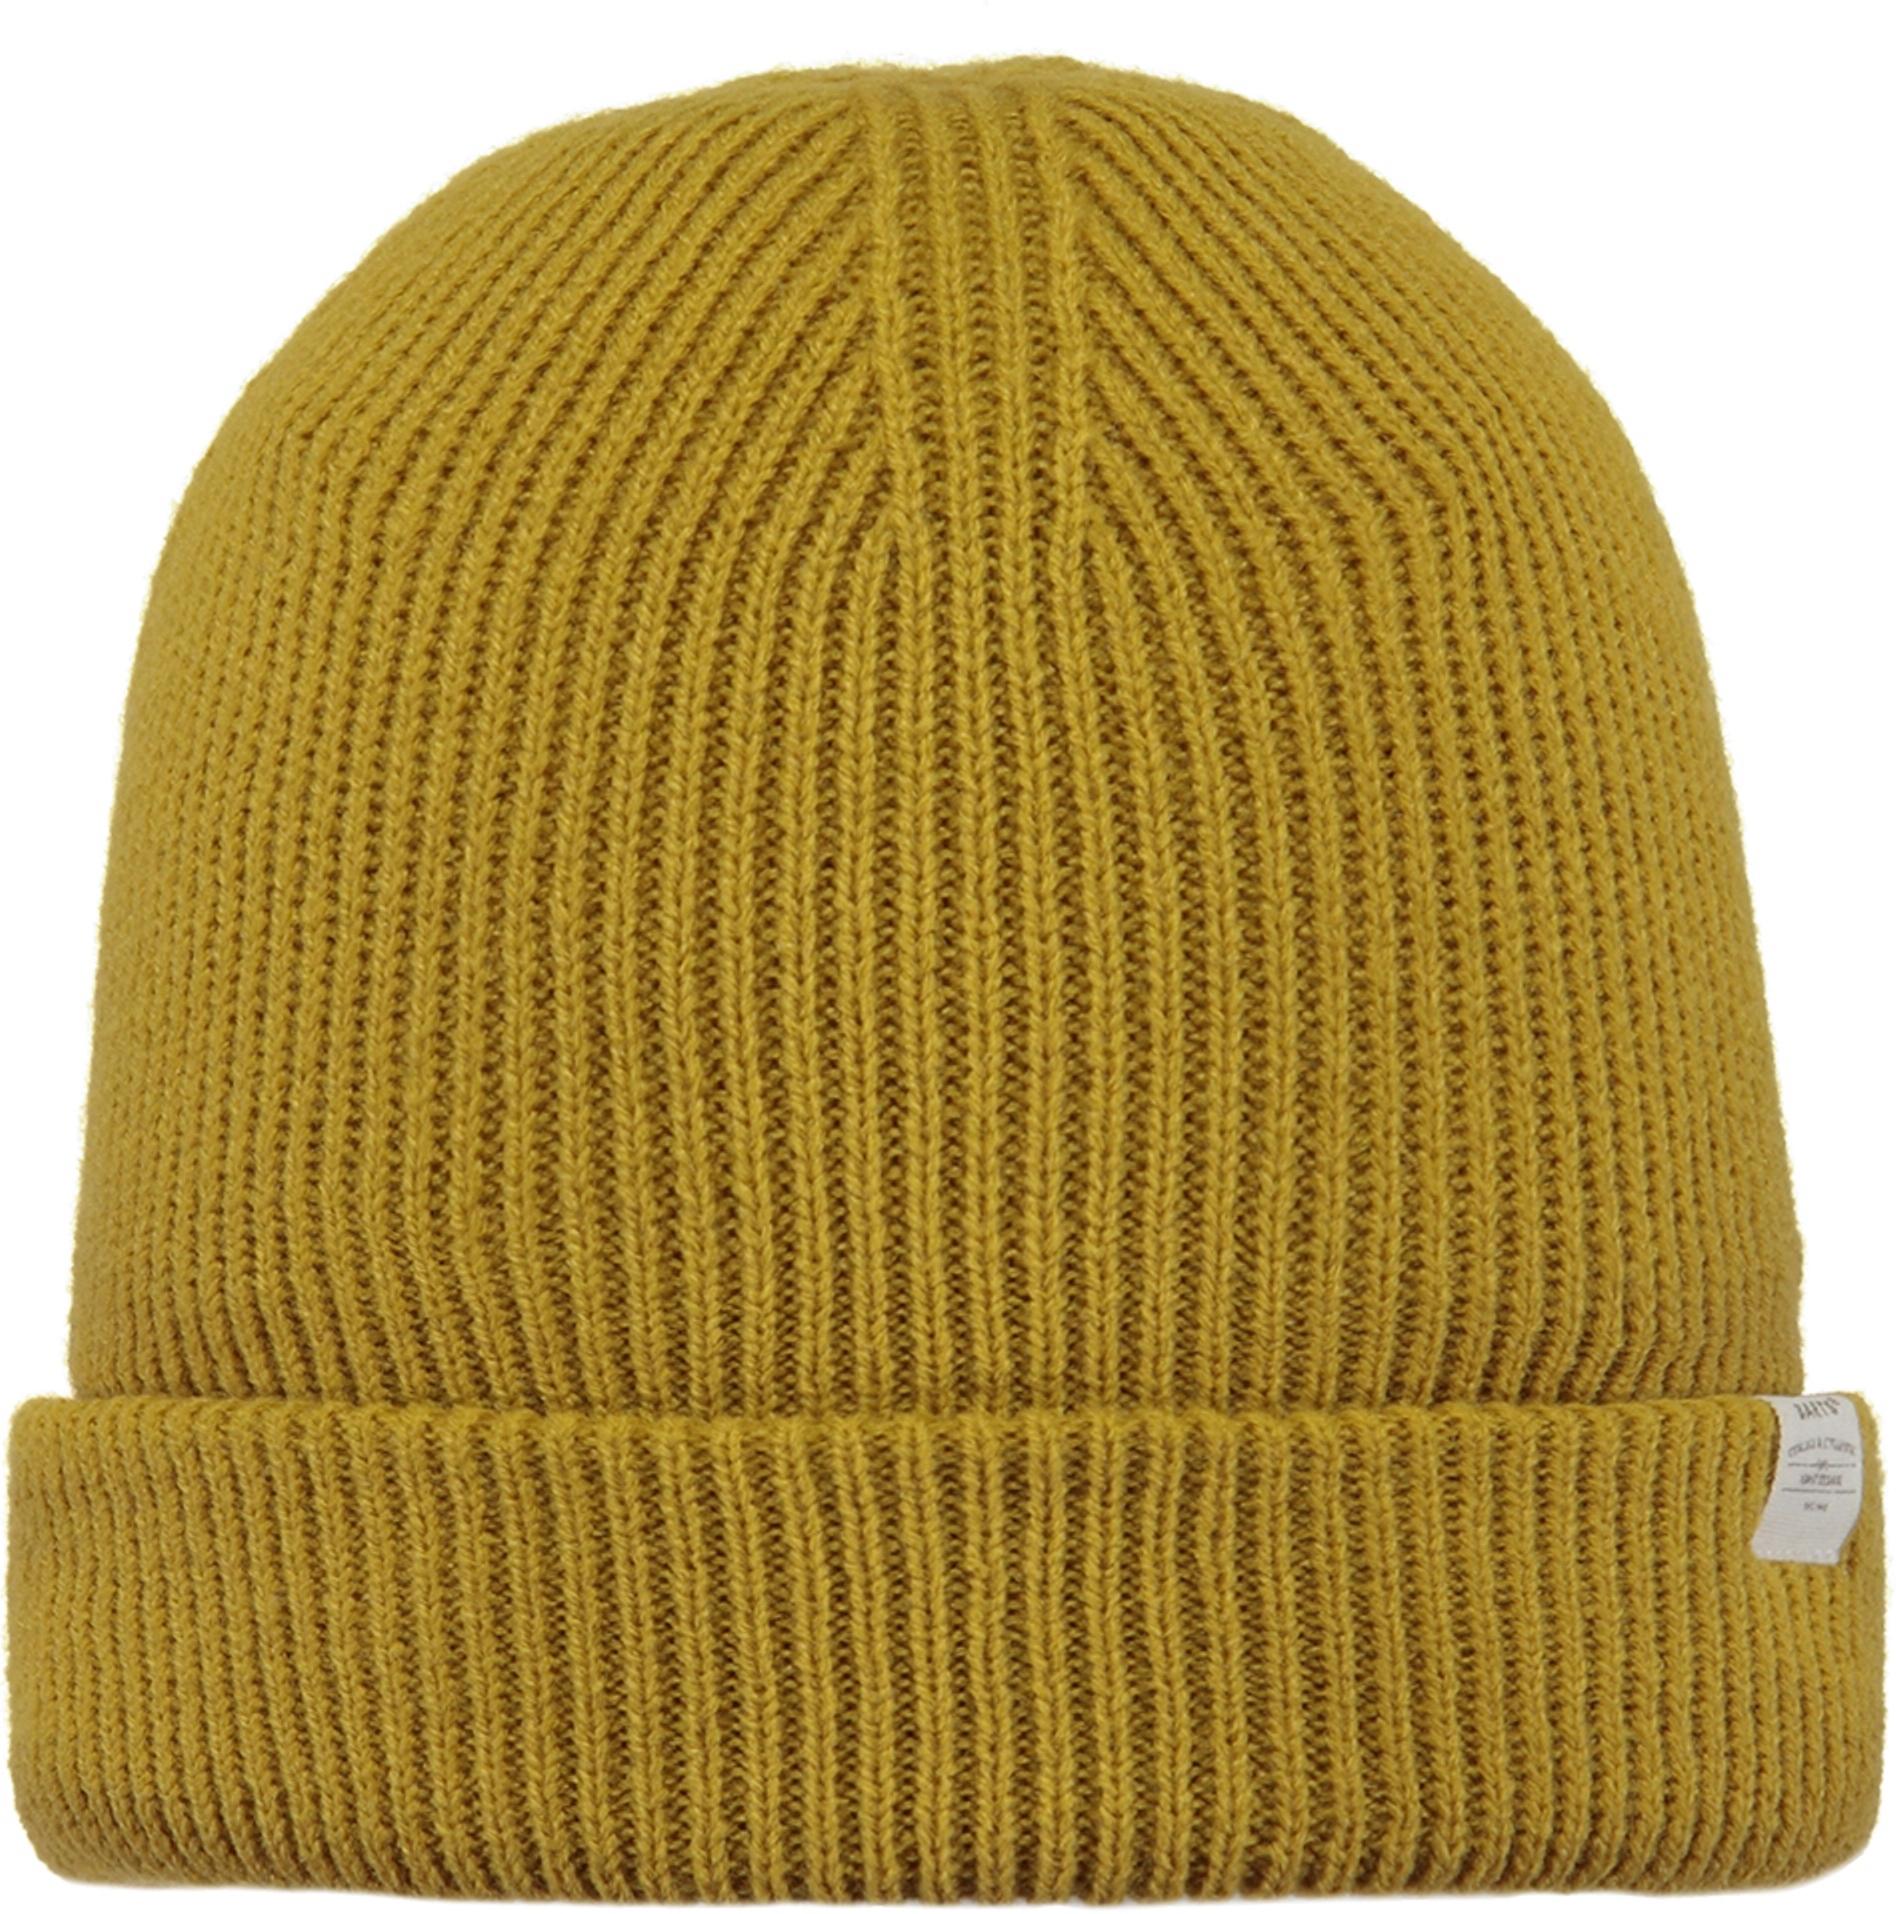 Barts Wintermütze Kinabalu yellow 53-55cm